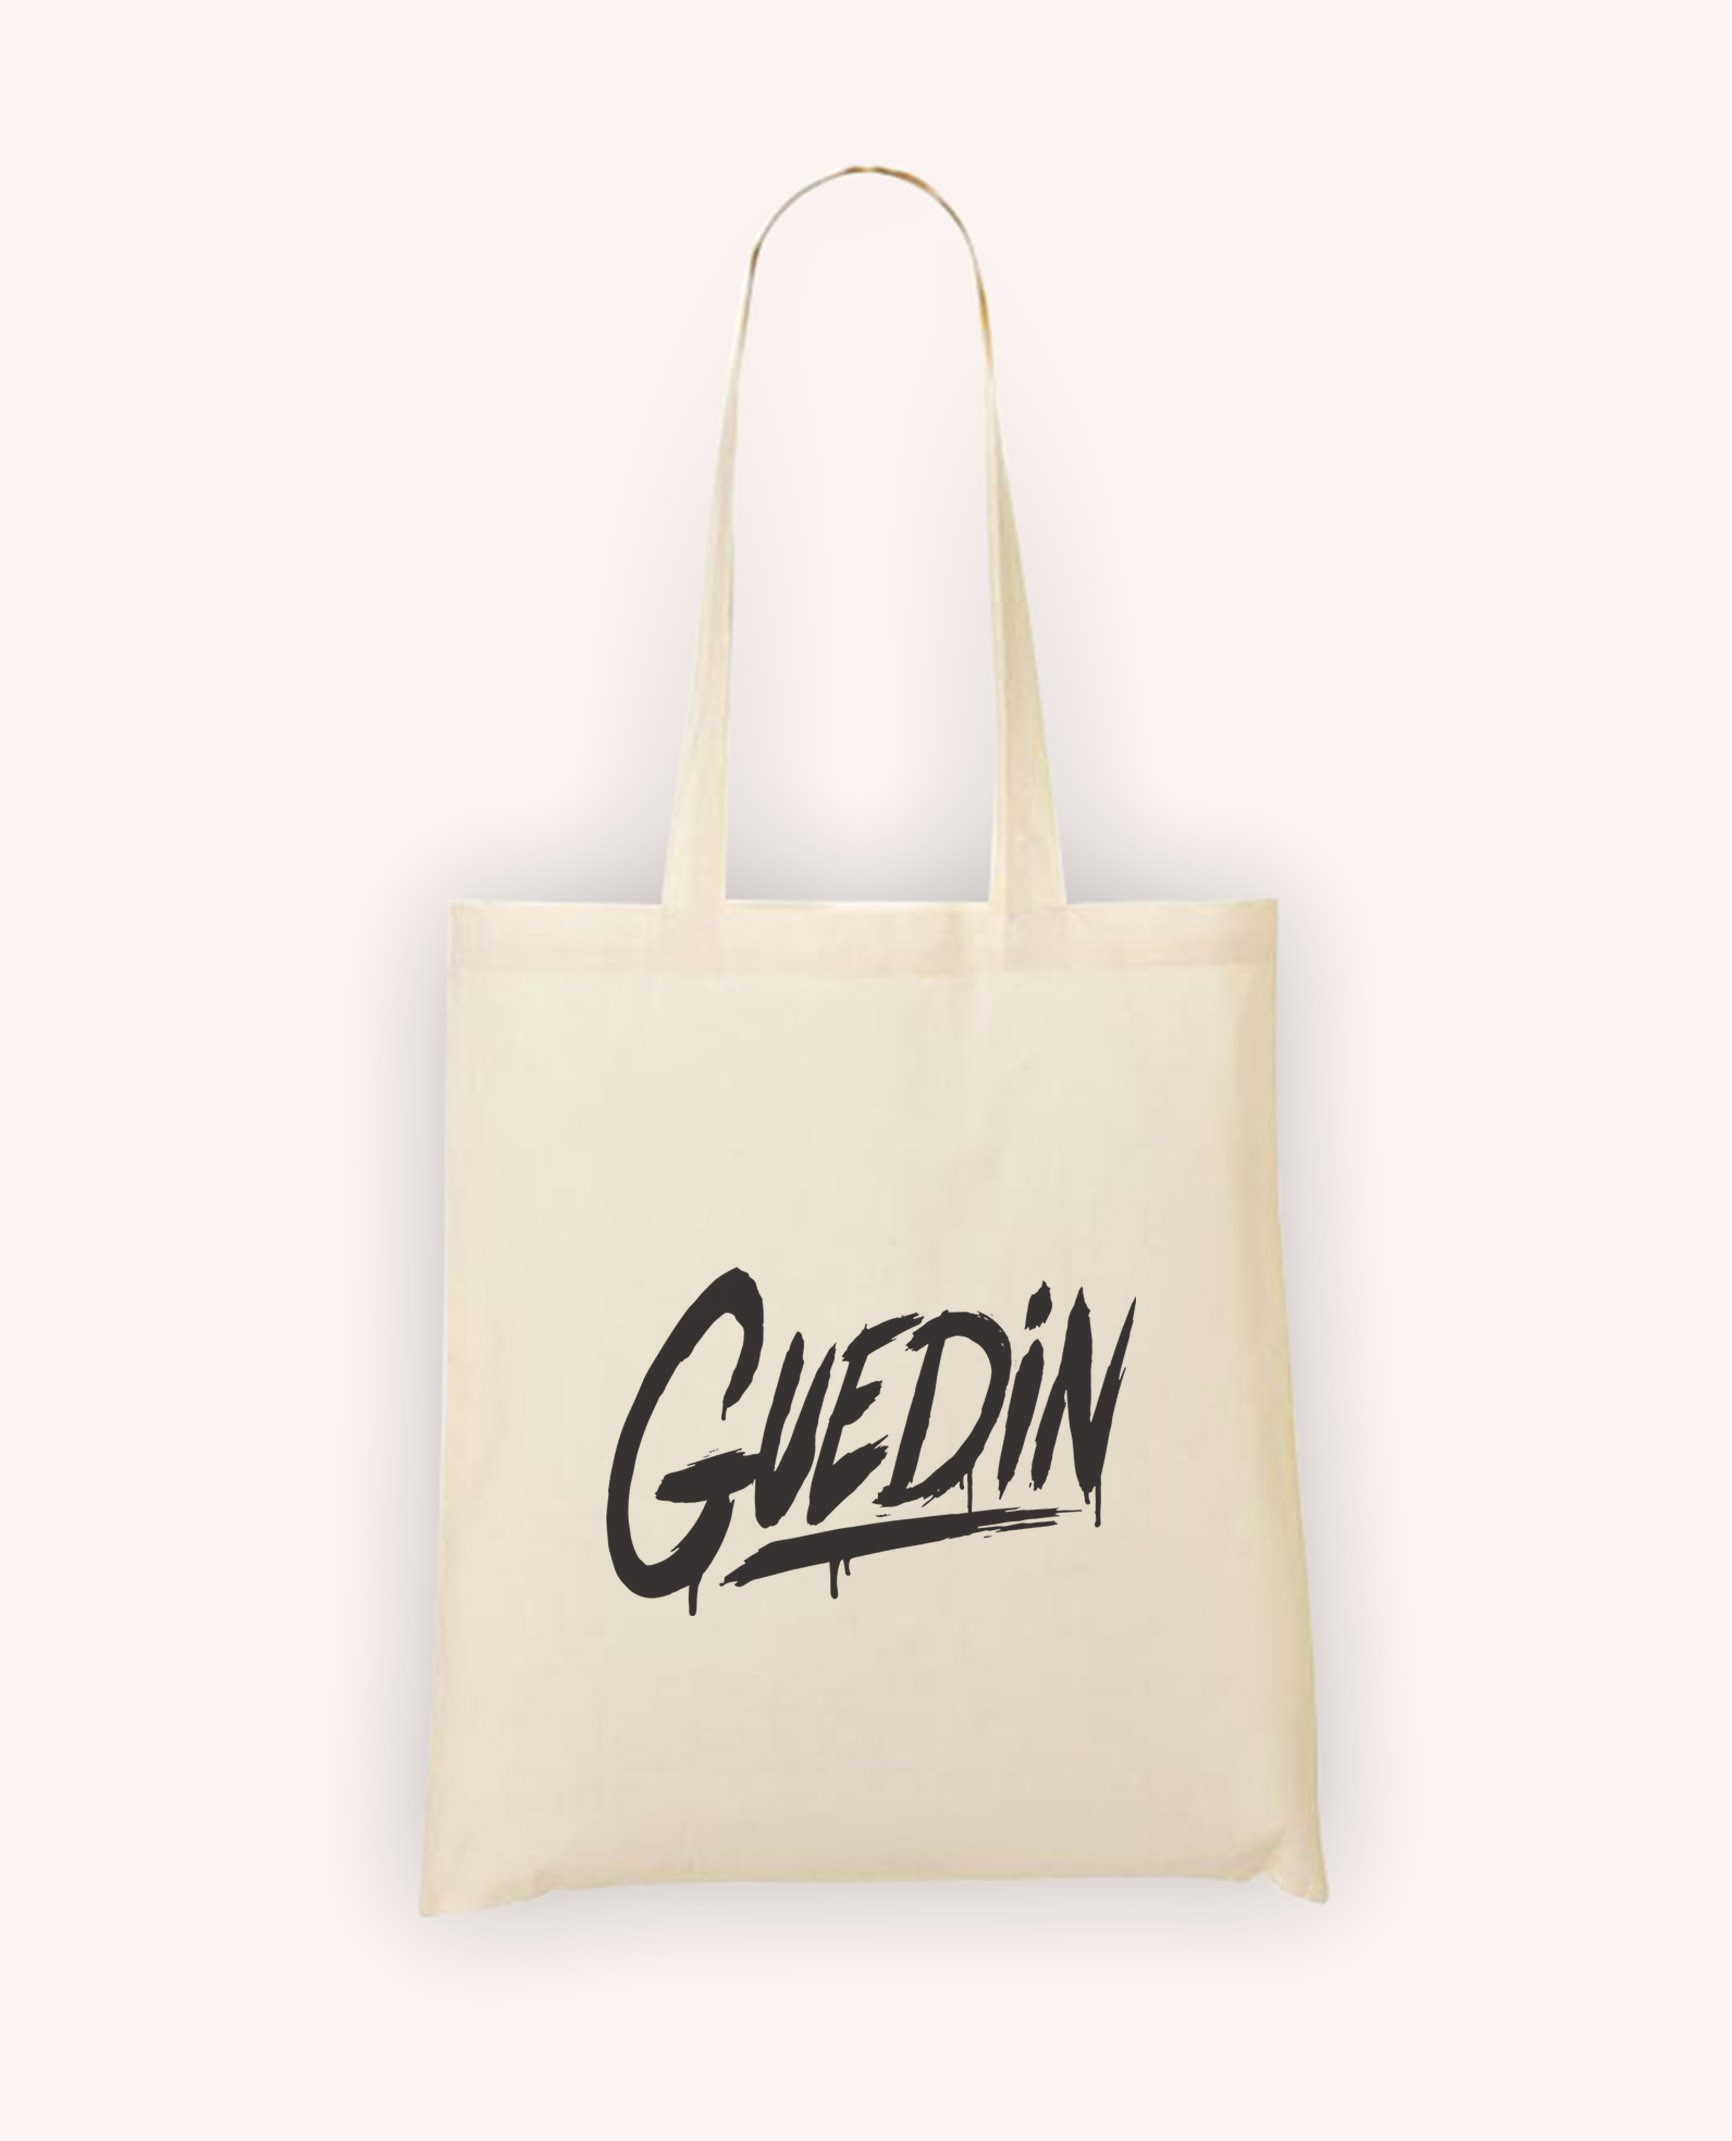 Totebag Guedin